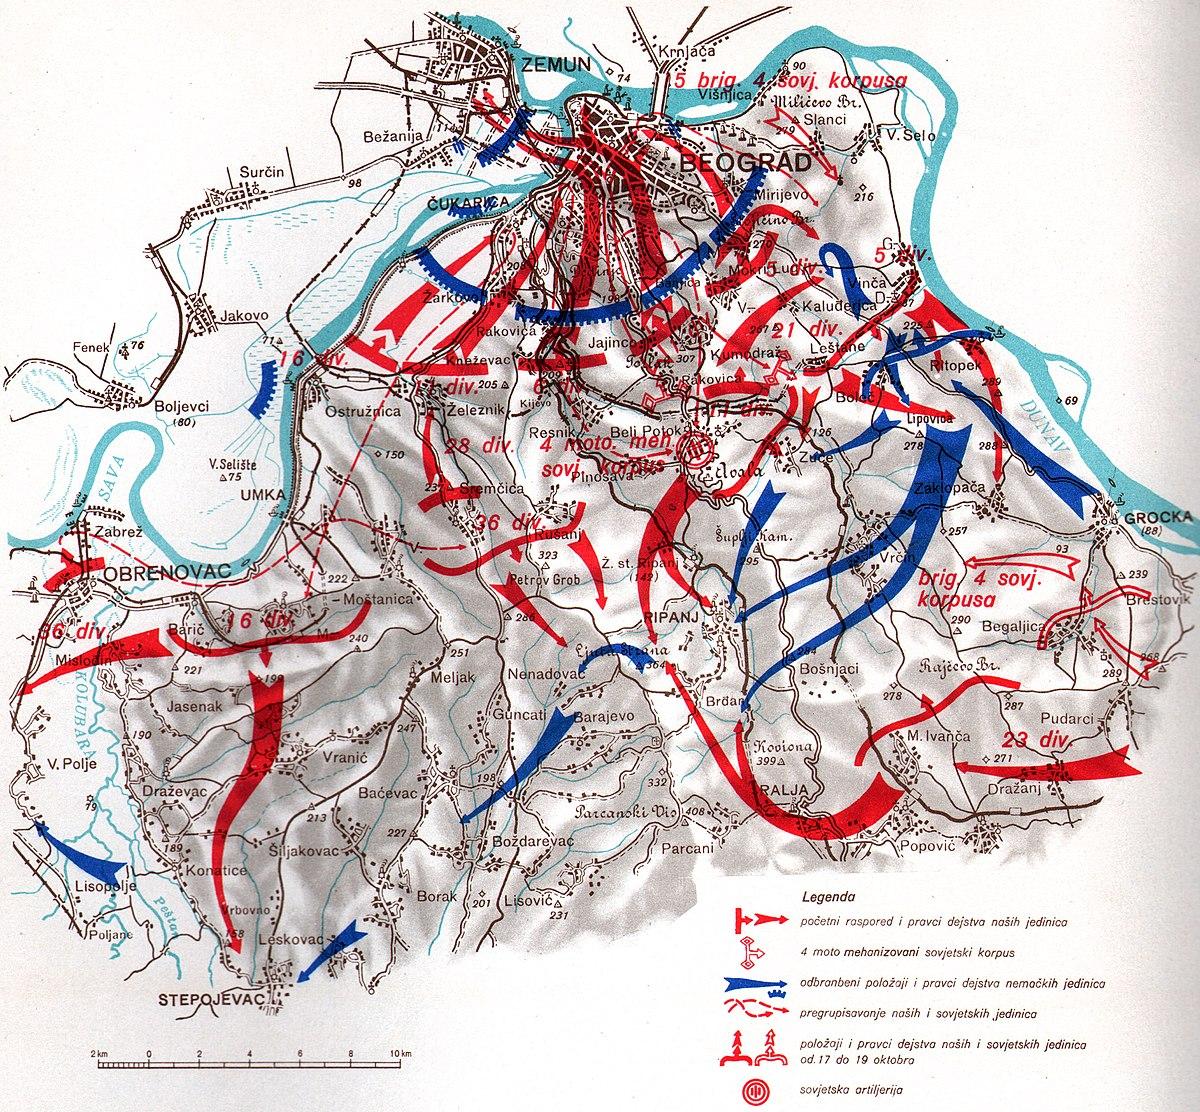 File Beogradska Operacija Jpg Wikimedia Commons